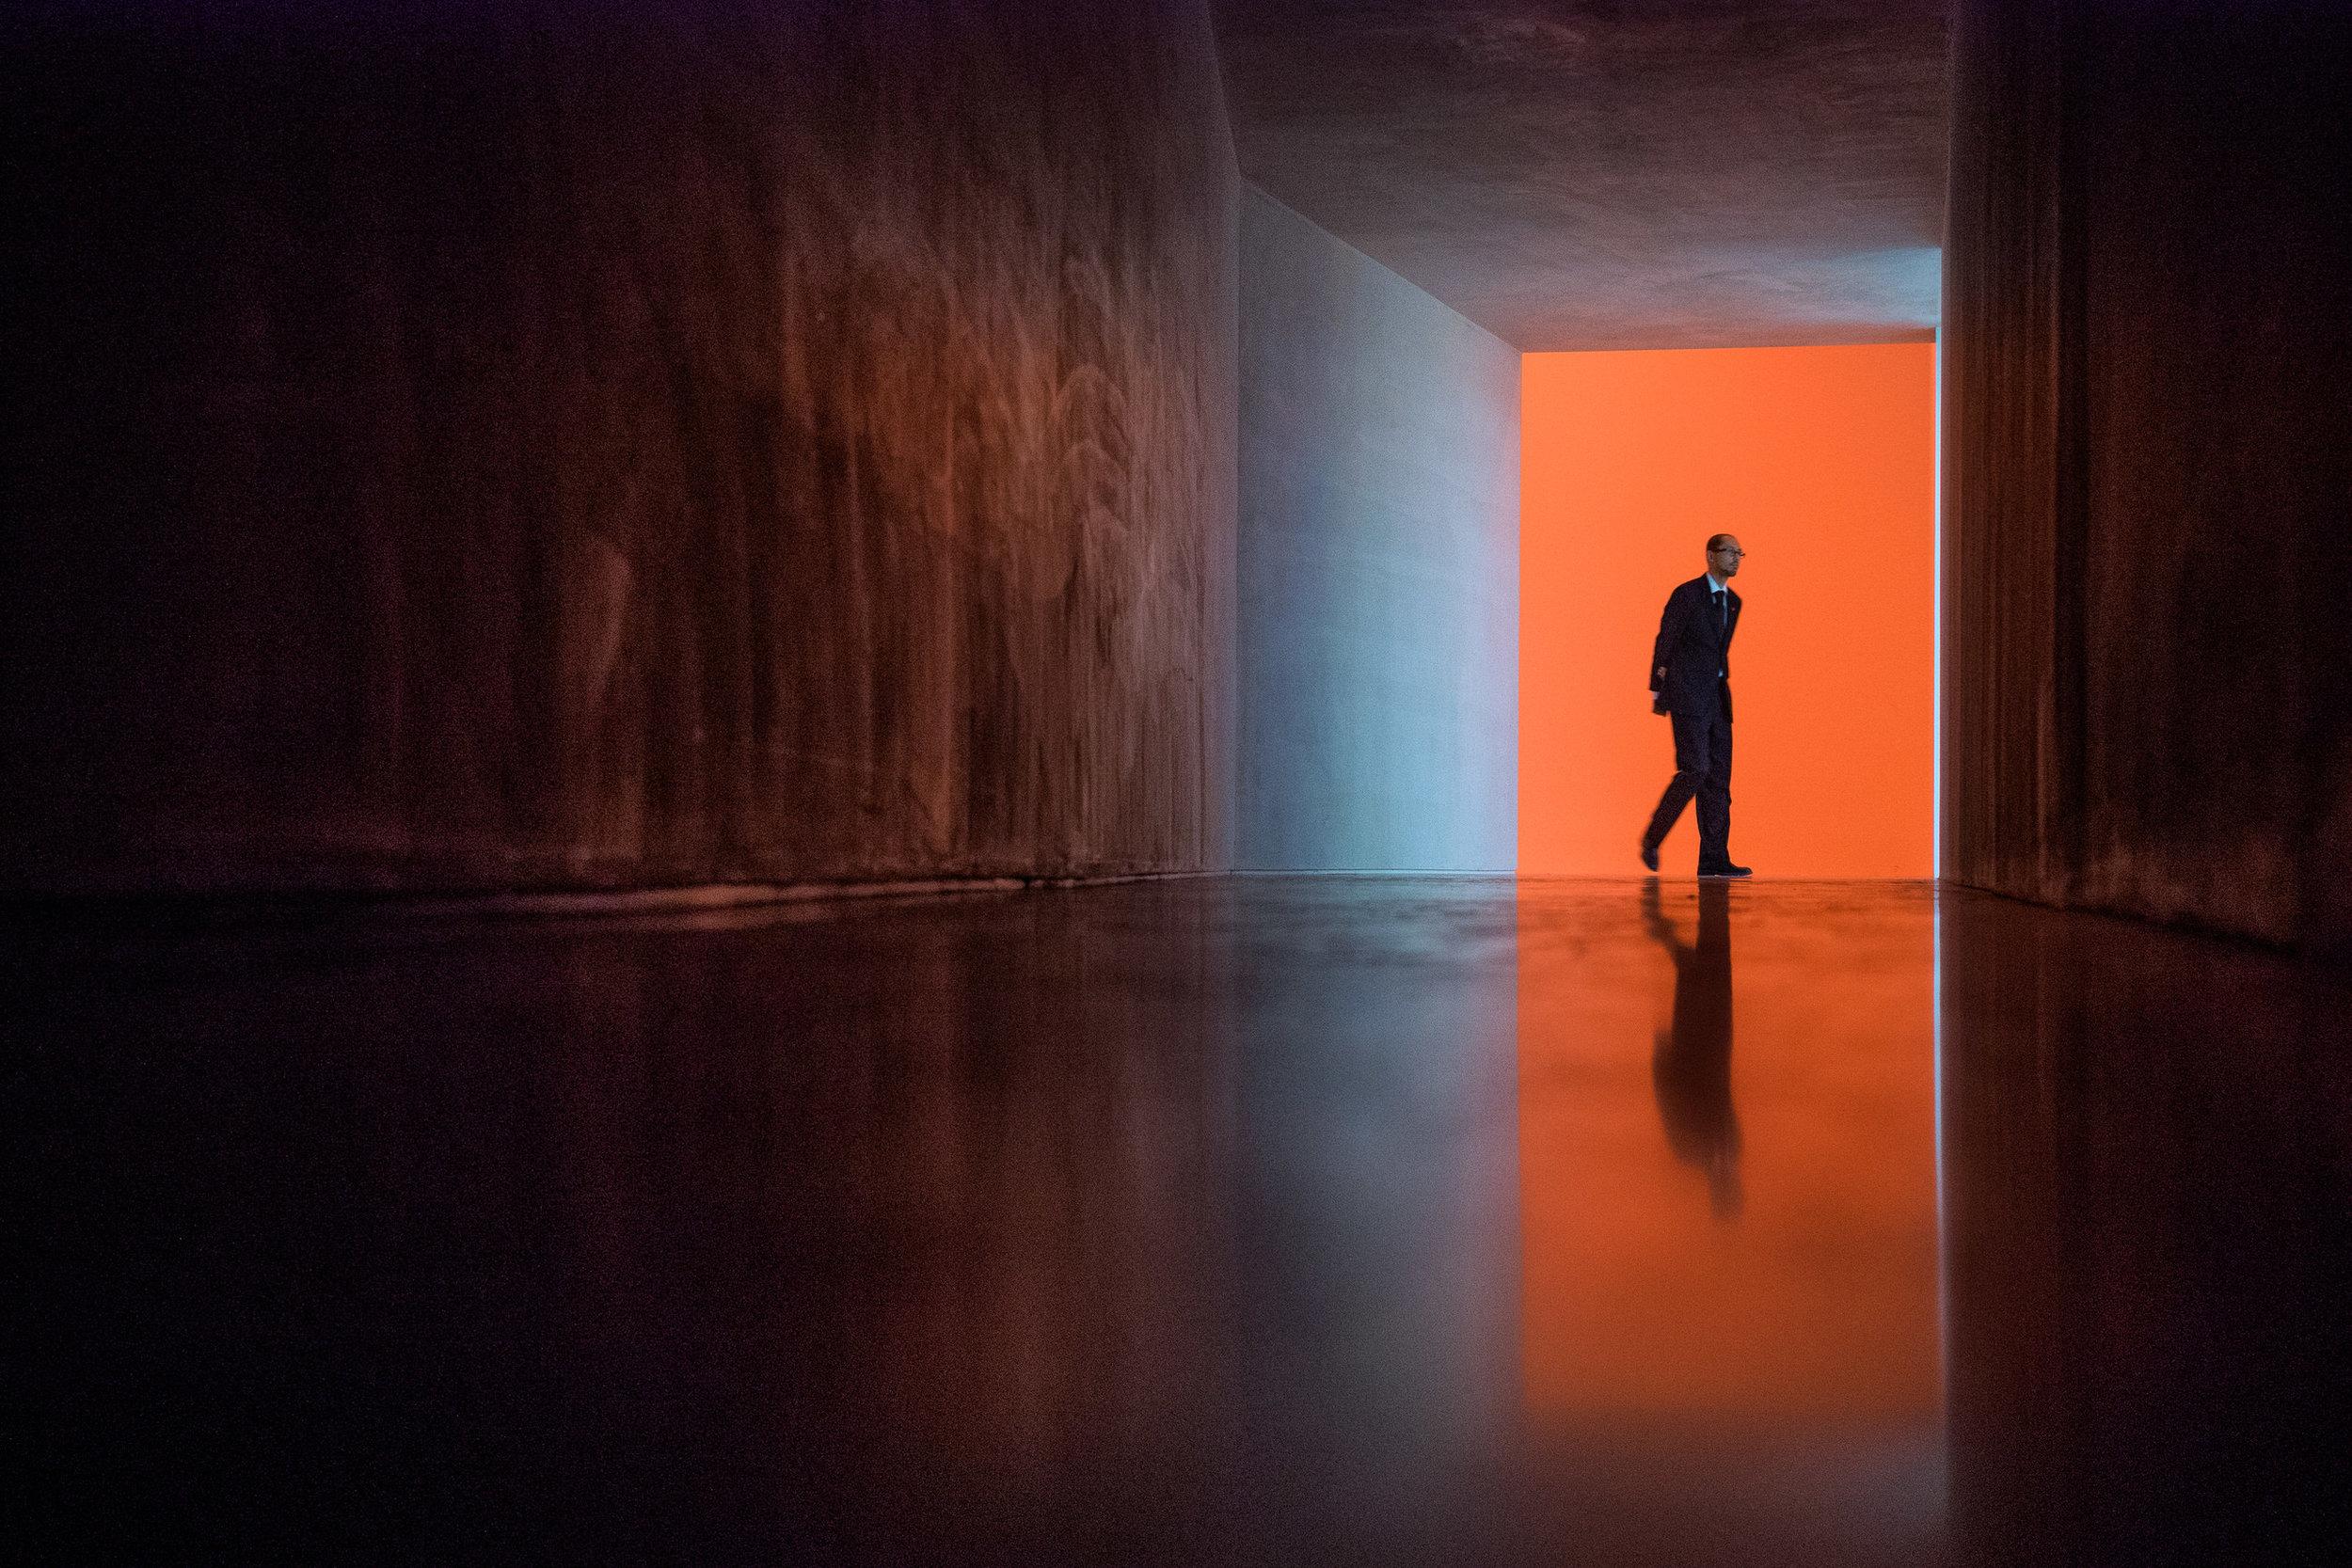 Craig-Reilly-Photography-White-Cube-orange.jpg